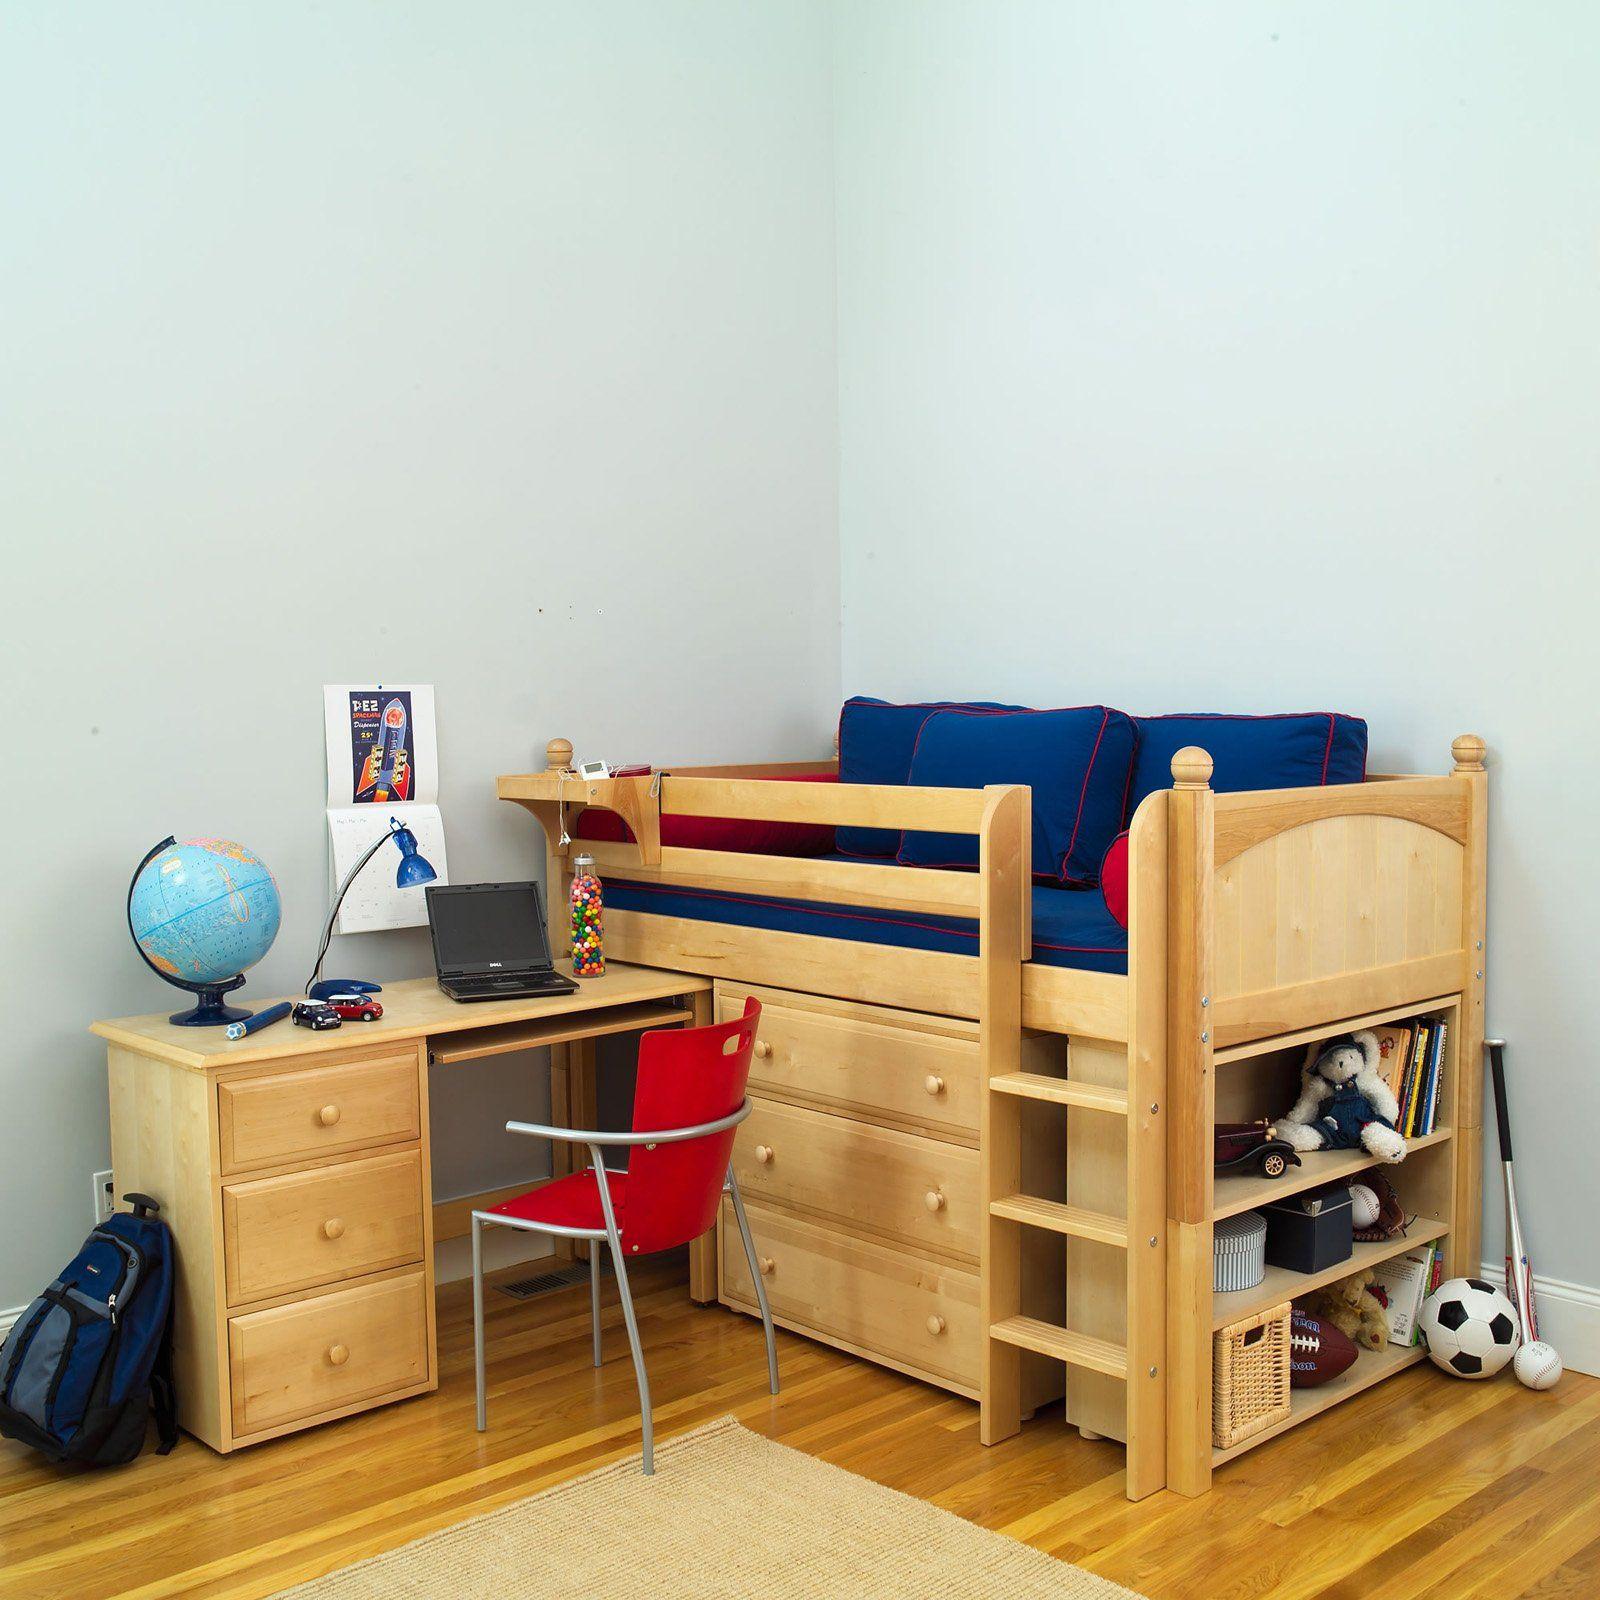 Loft bedroom for boys  Have to have it Box  Panel Storage Study Loft   Hockey